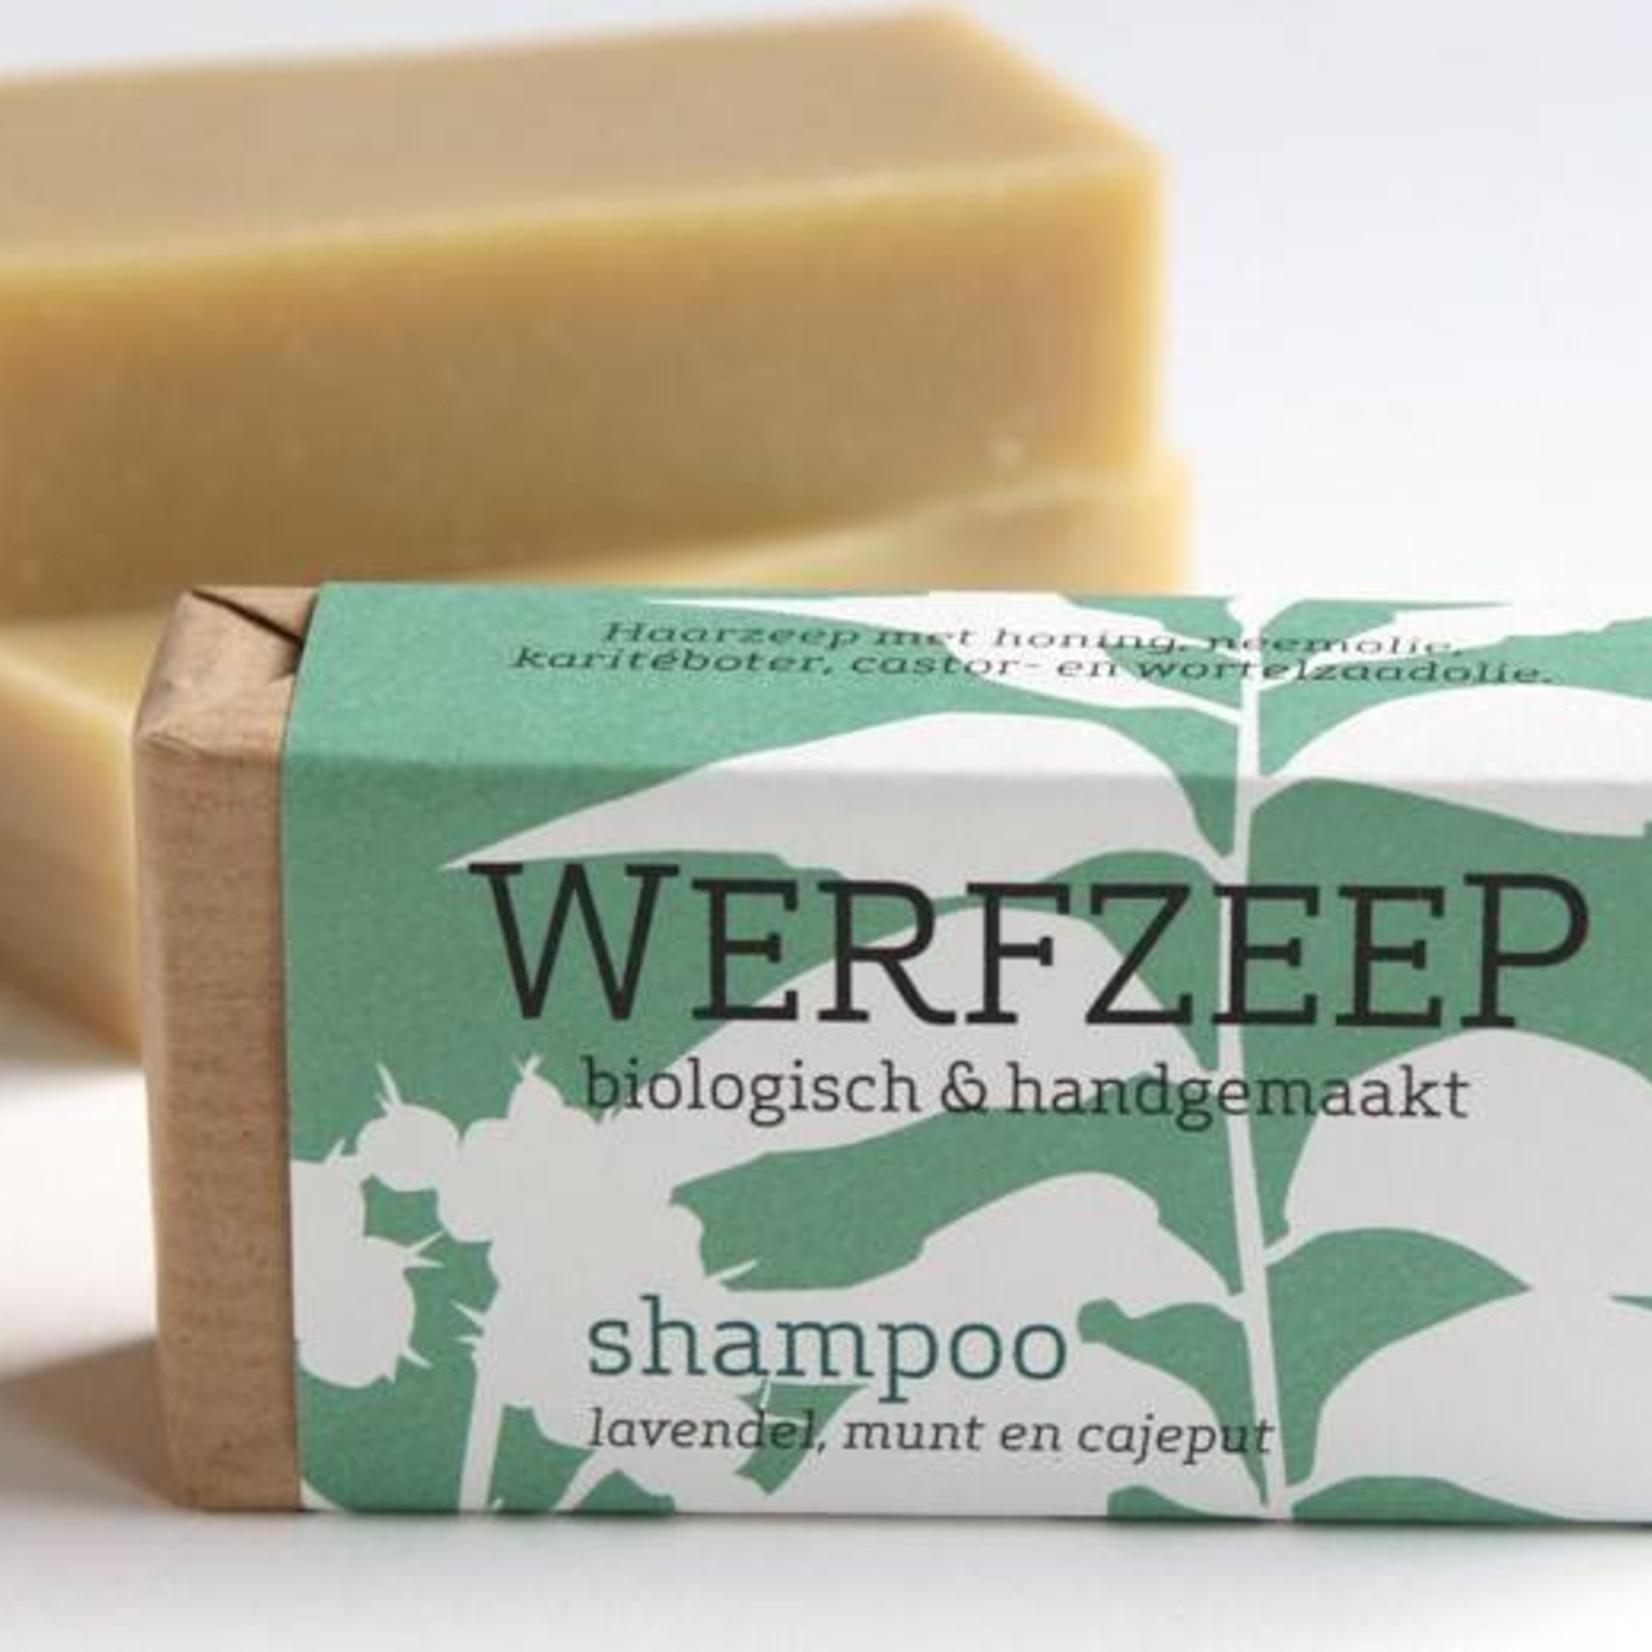 Werfzeep Biologische Werfzeep Shampoo